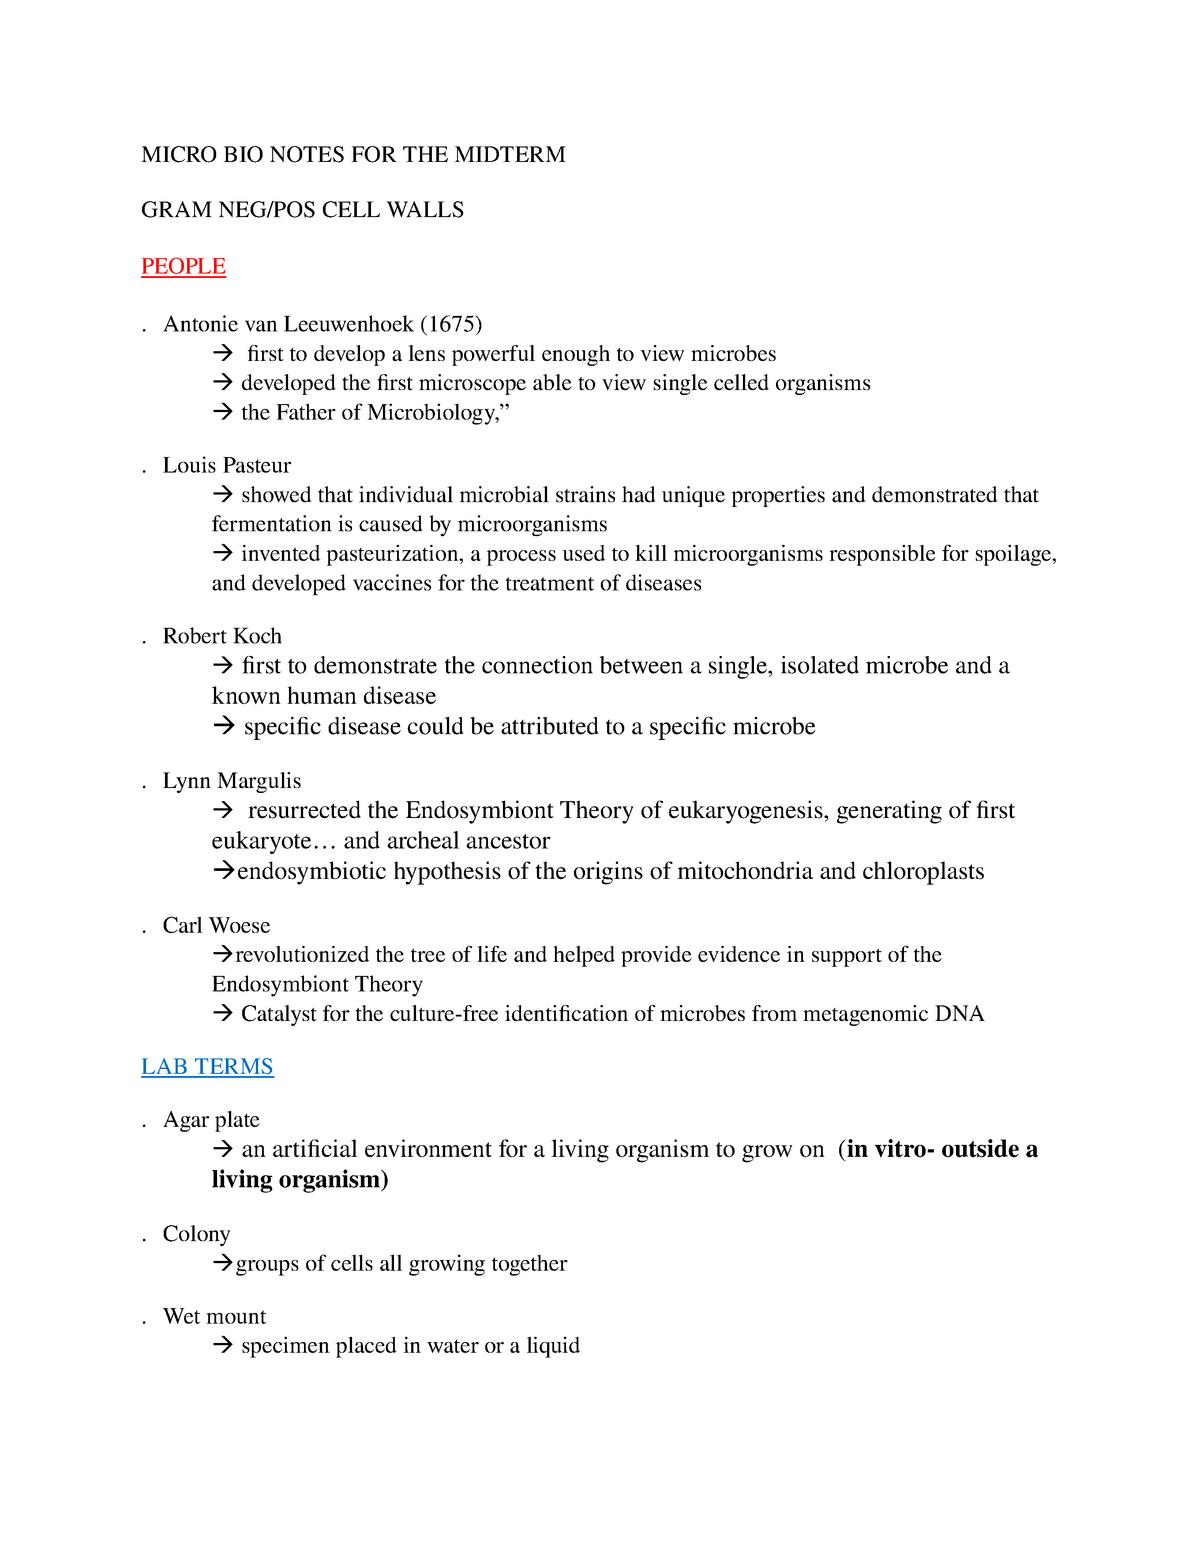 Micro BIO Notes FOR THE Midterm - Micr2420 - U of G - StuDocu